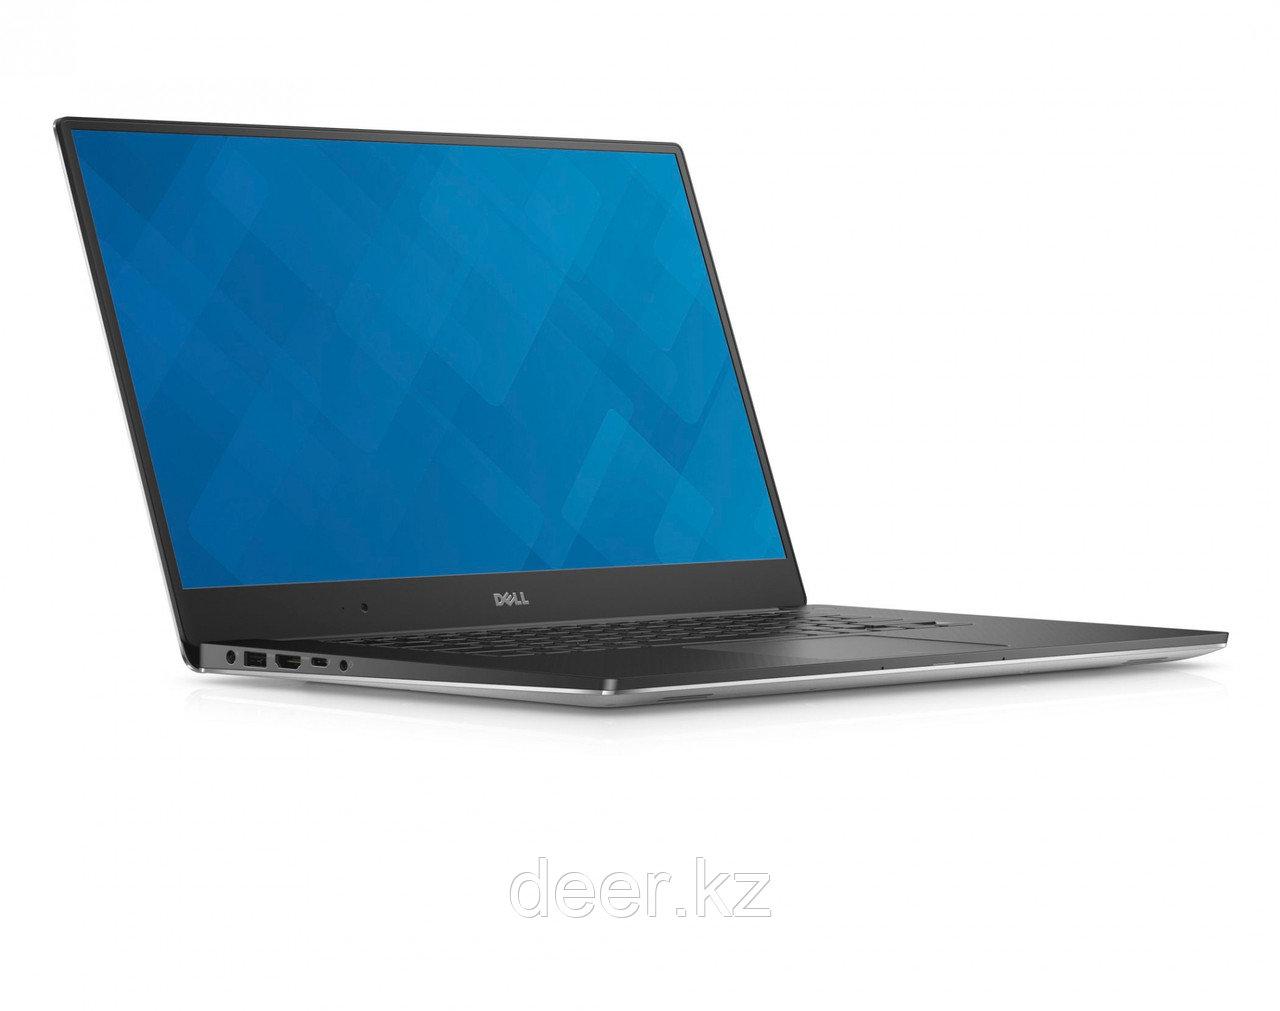 Ноутбук Dell 13,3 ''/XPS 13 (9360) /Intel Core i5 8250U 210-AMVY_9360-582WS